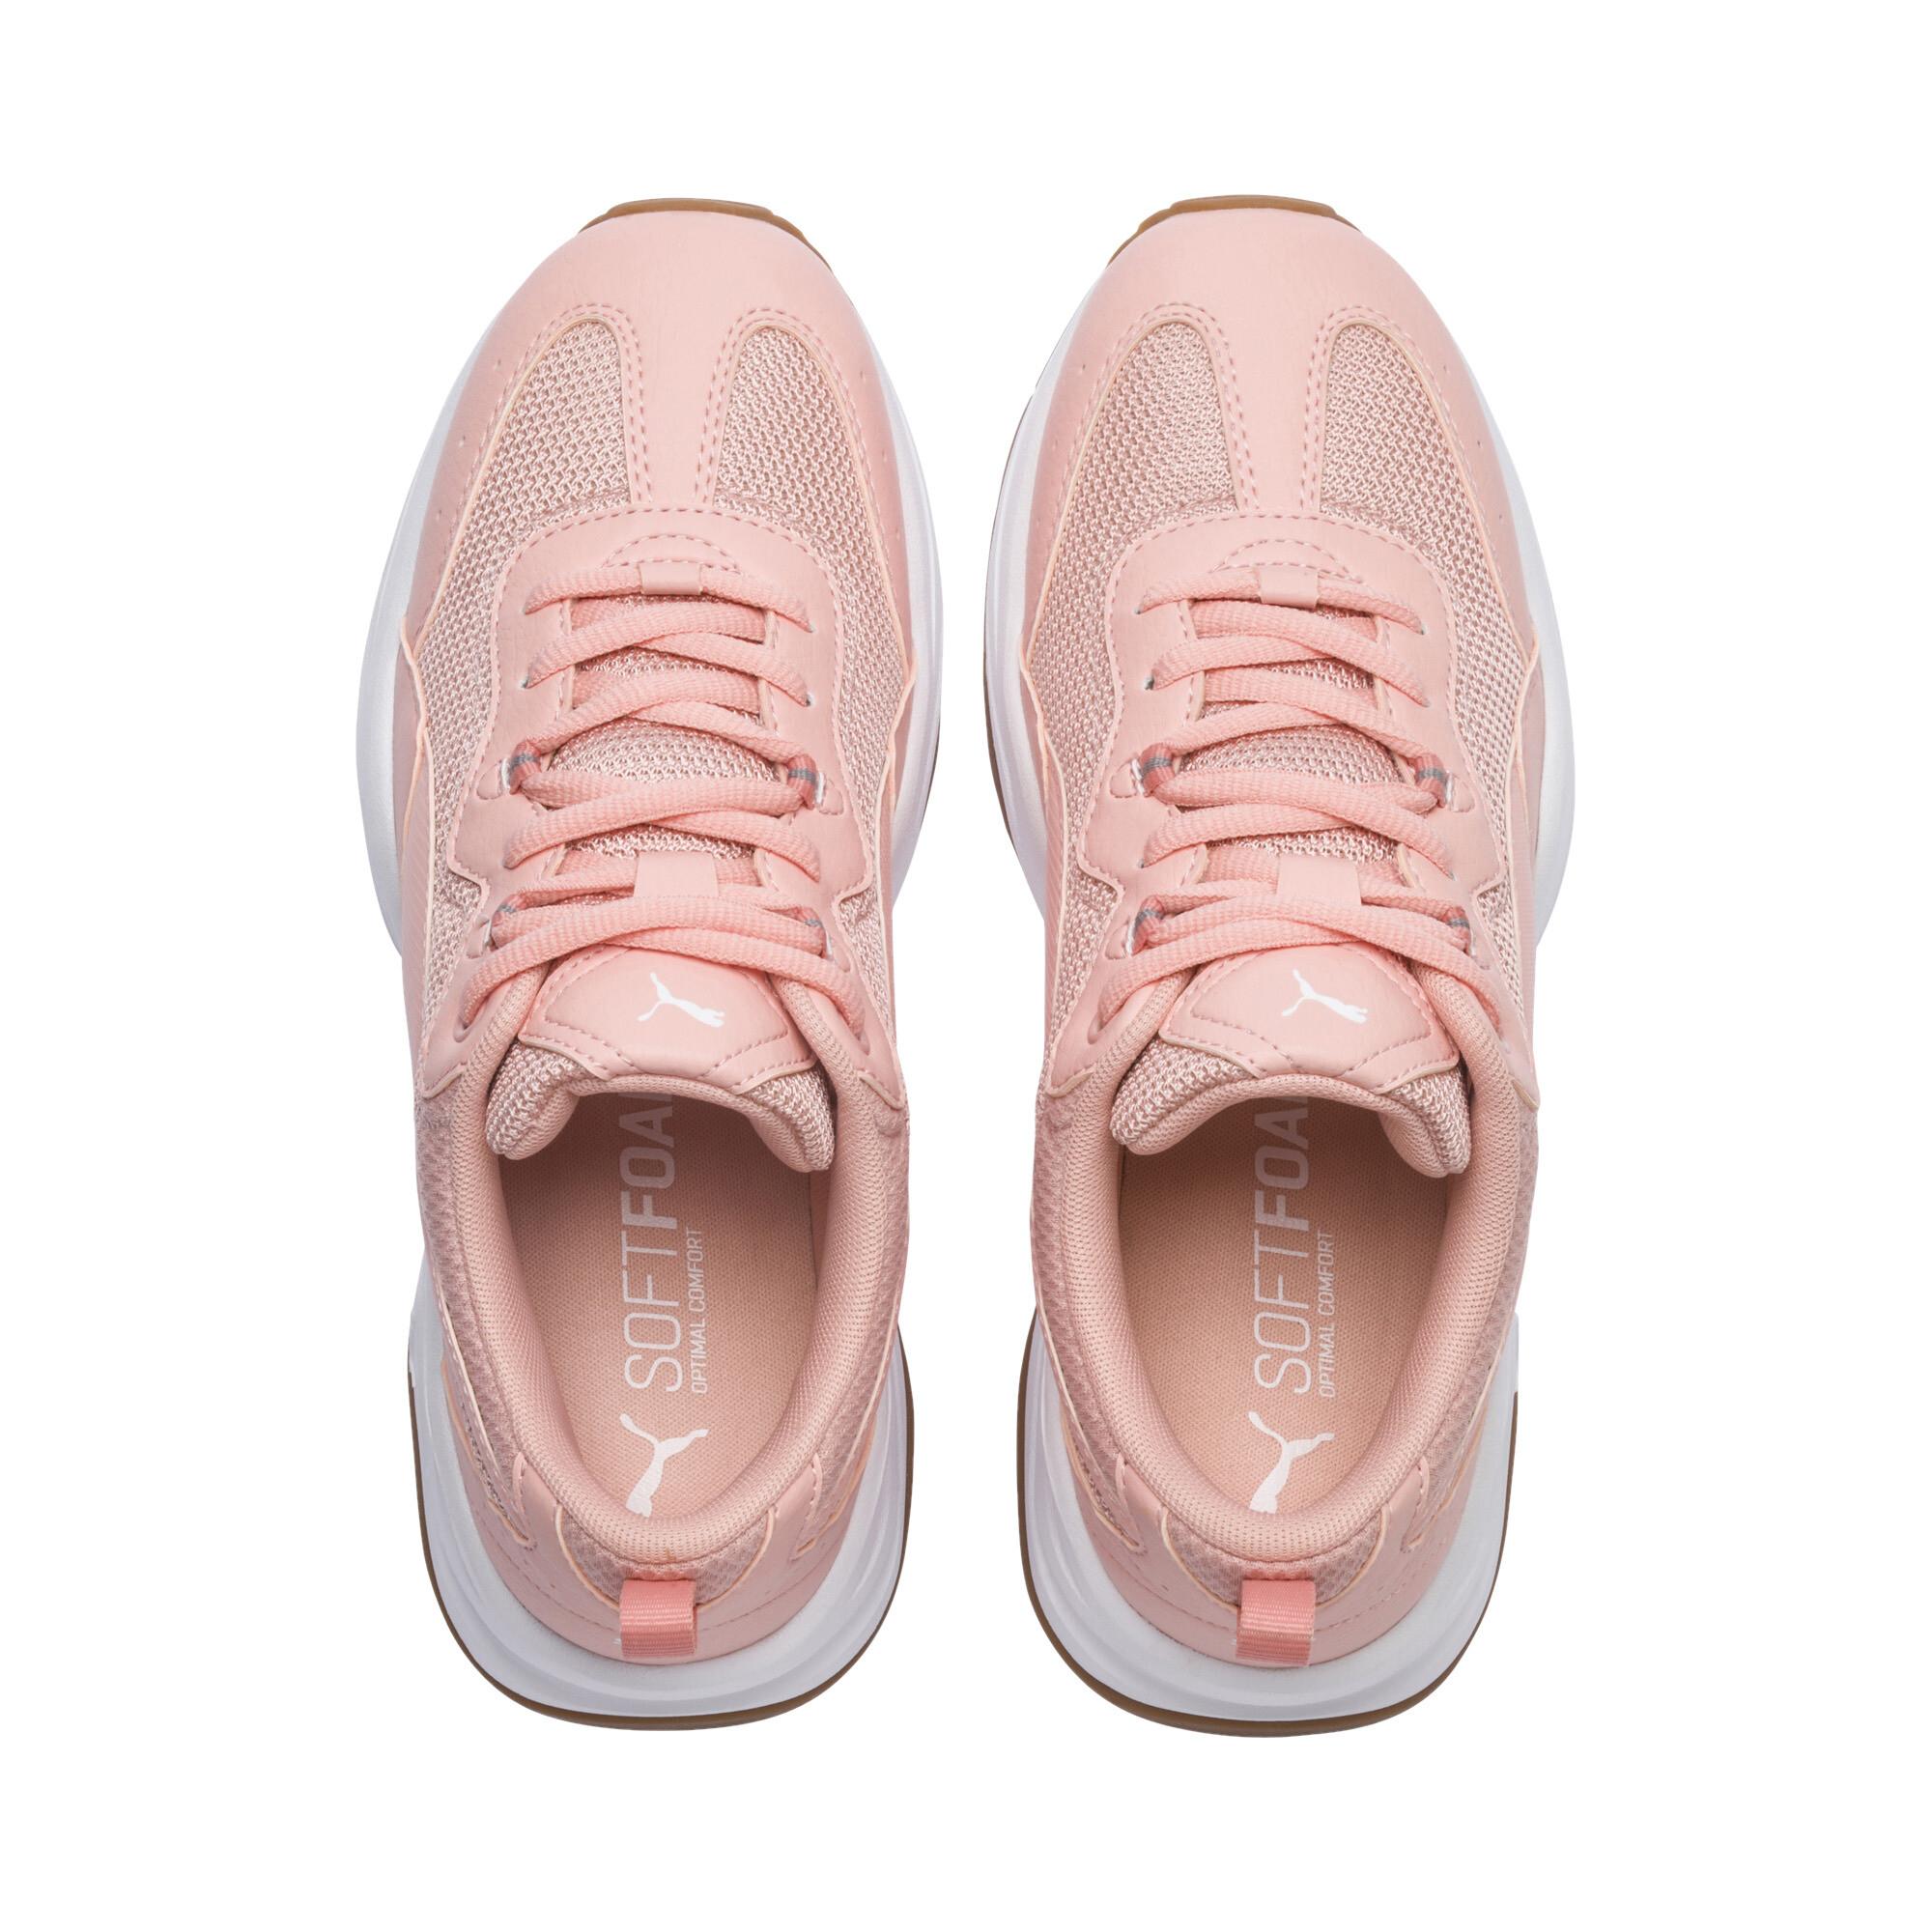 PUMA-Cilia-Women-039-s-Sneakers-Women-Shoe-Basics thumbnail 7